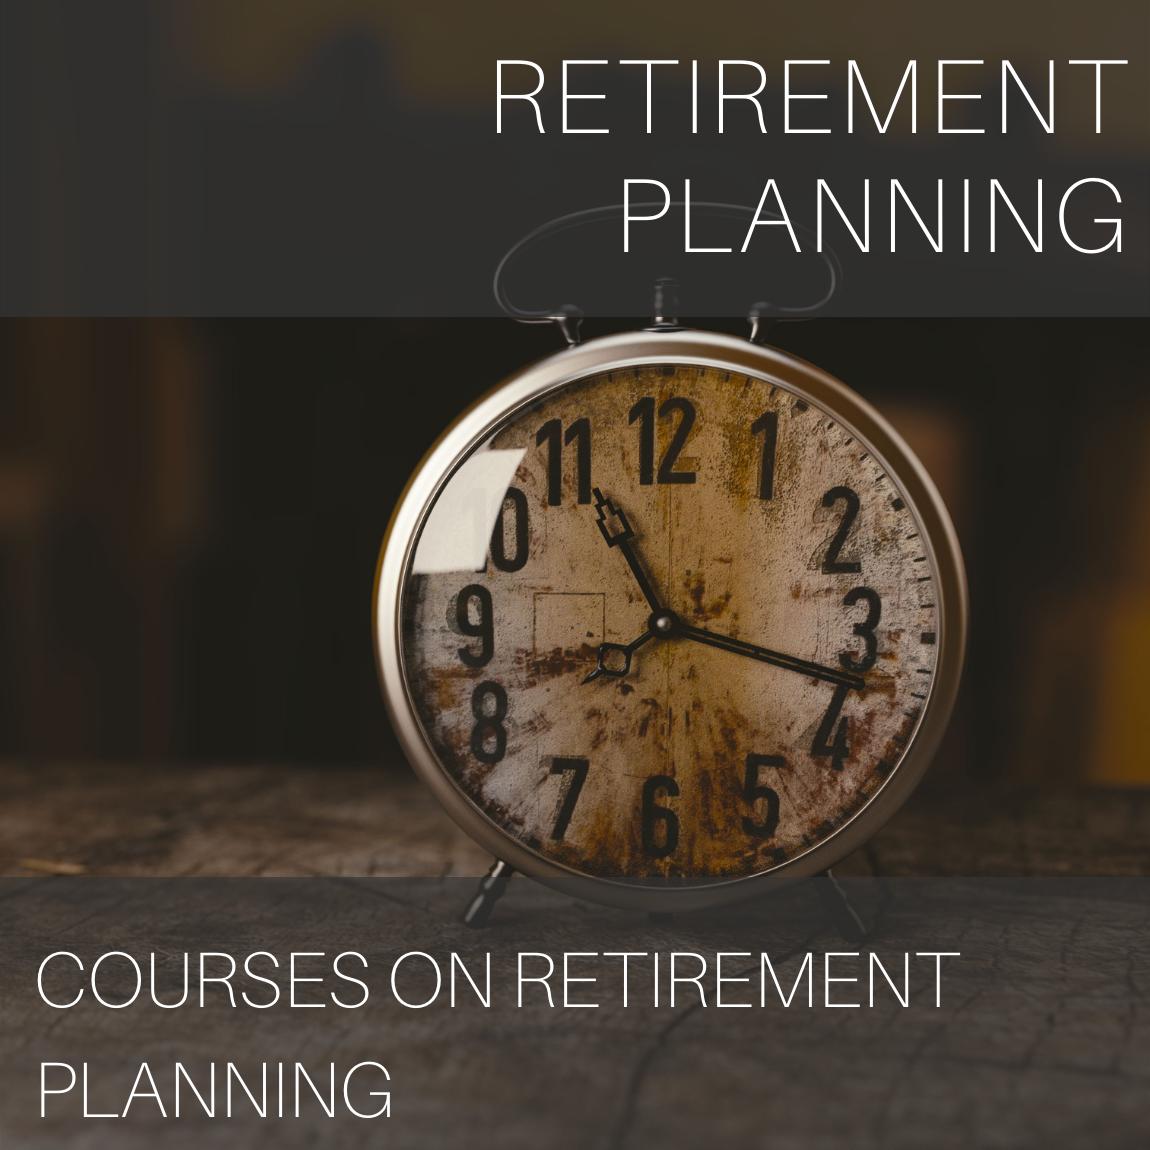 Retirement squarebanner 031821